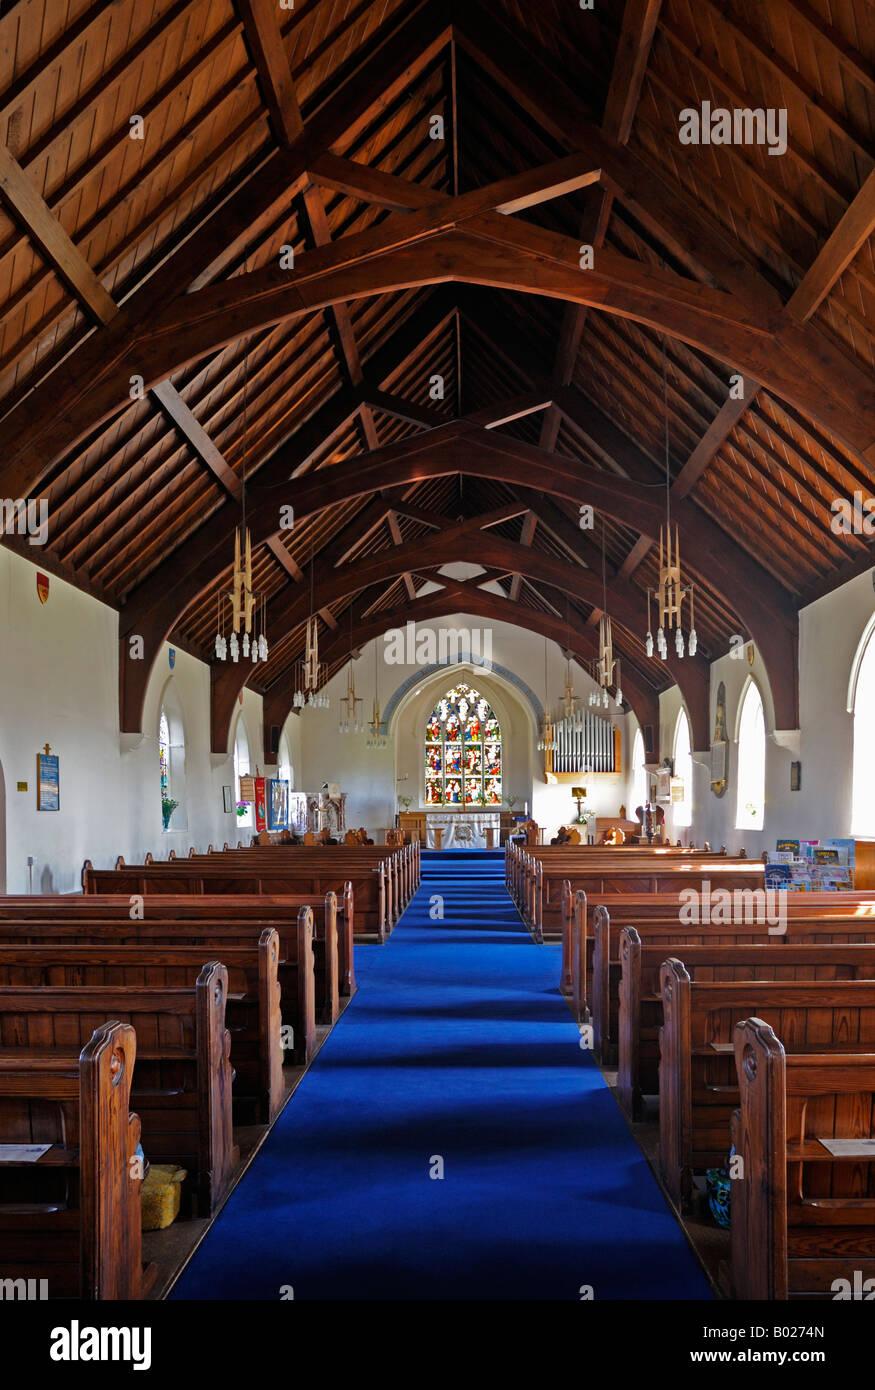 interior-looking-east-church-of-saint-mary-the-virgin-hambleton-lancashire-B0274N.jpg